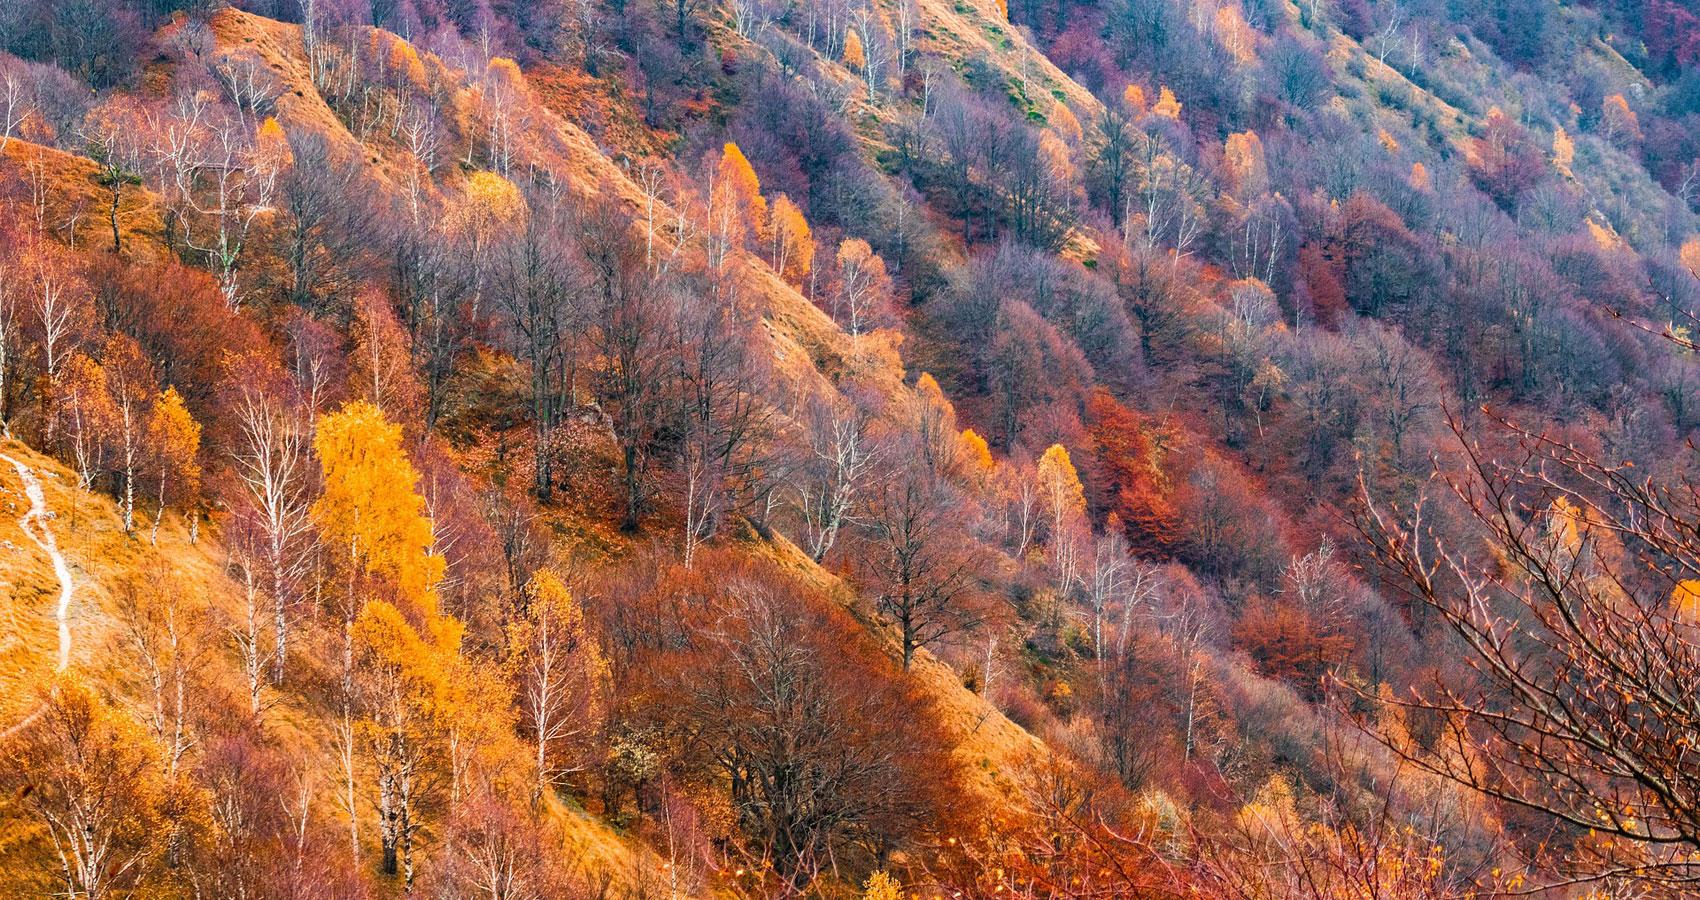 Autumn Moment written by Annalia Fioreat Spillwords.com